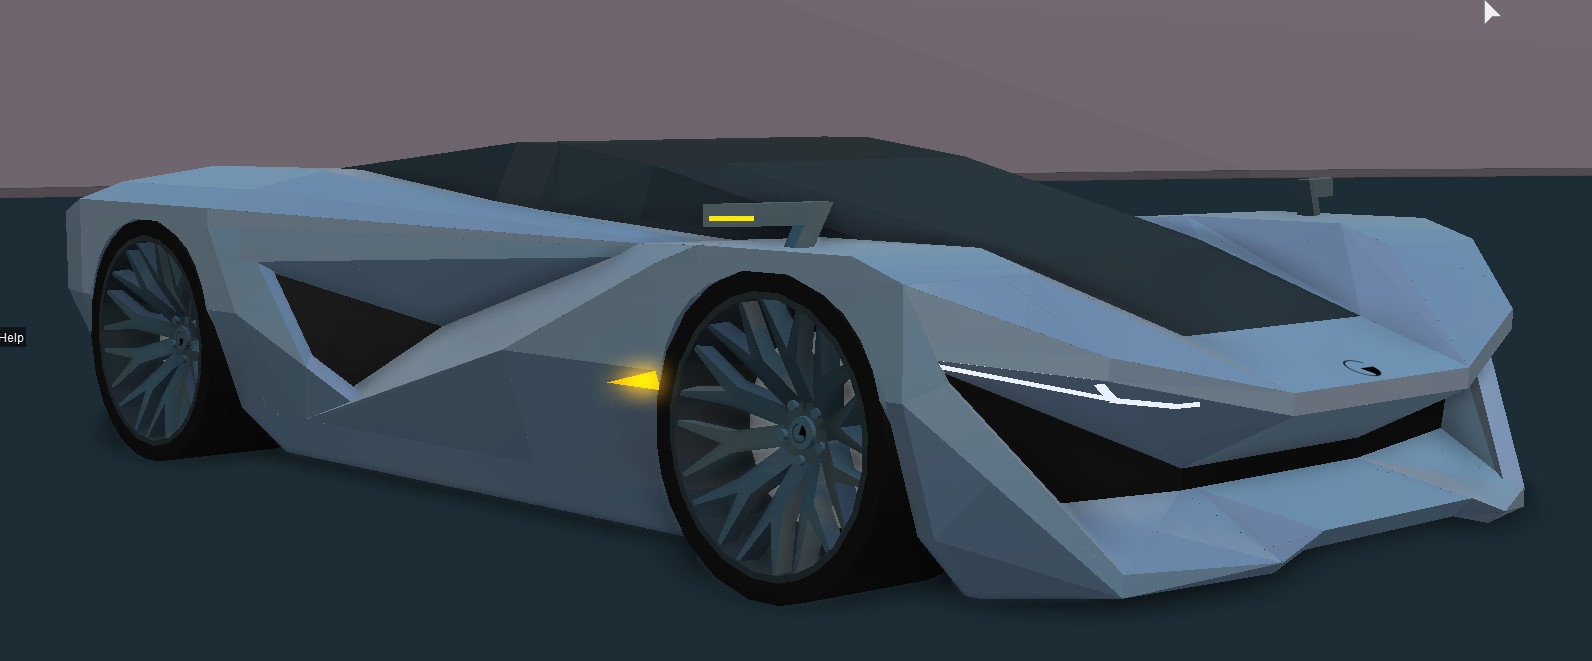 A1 Auto Sales >> Grandeur Automobiles Esteem | Roblox vehicles Wiki | FANDOM powered by Wikia